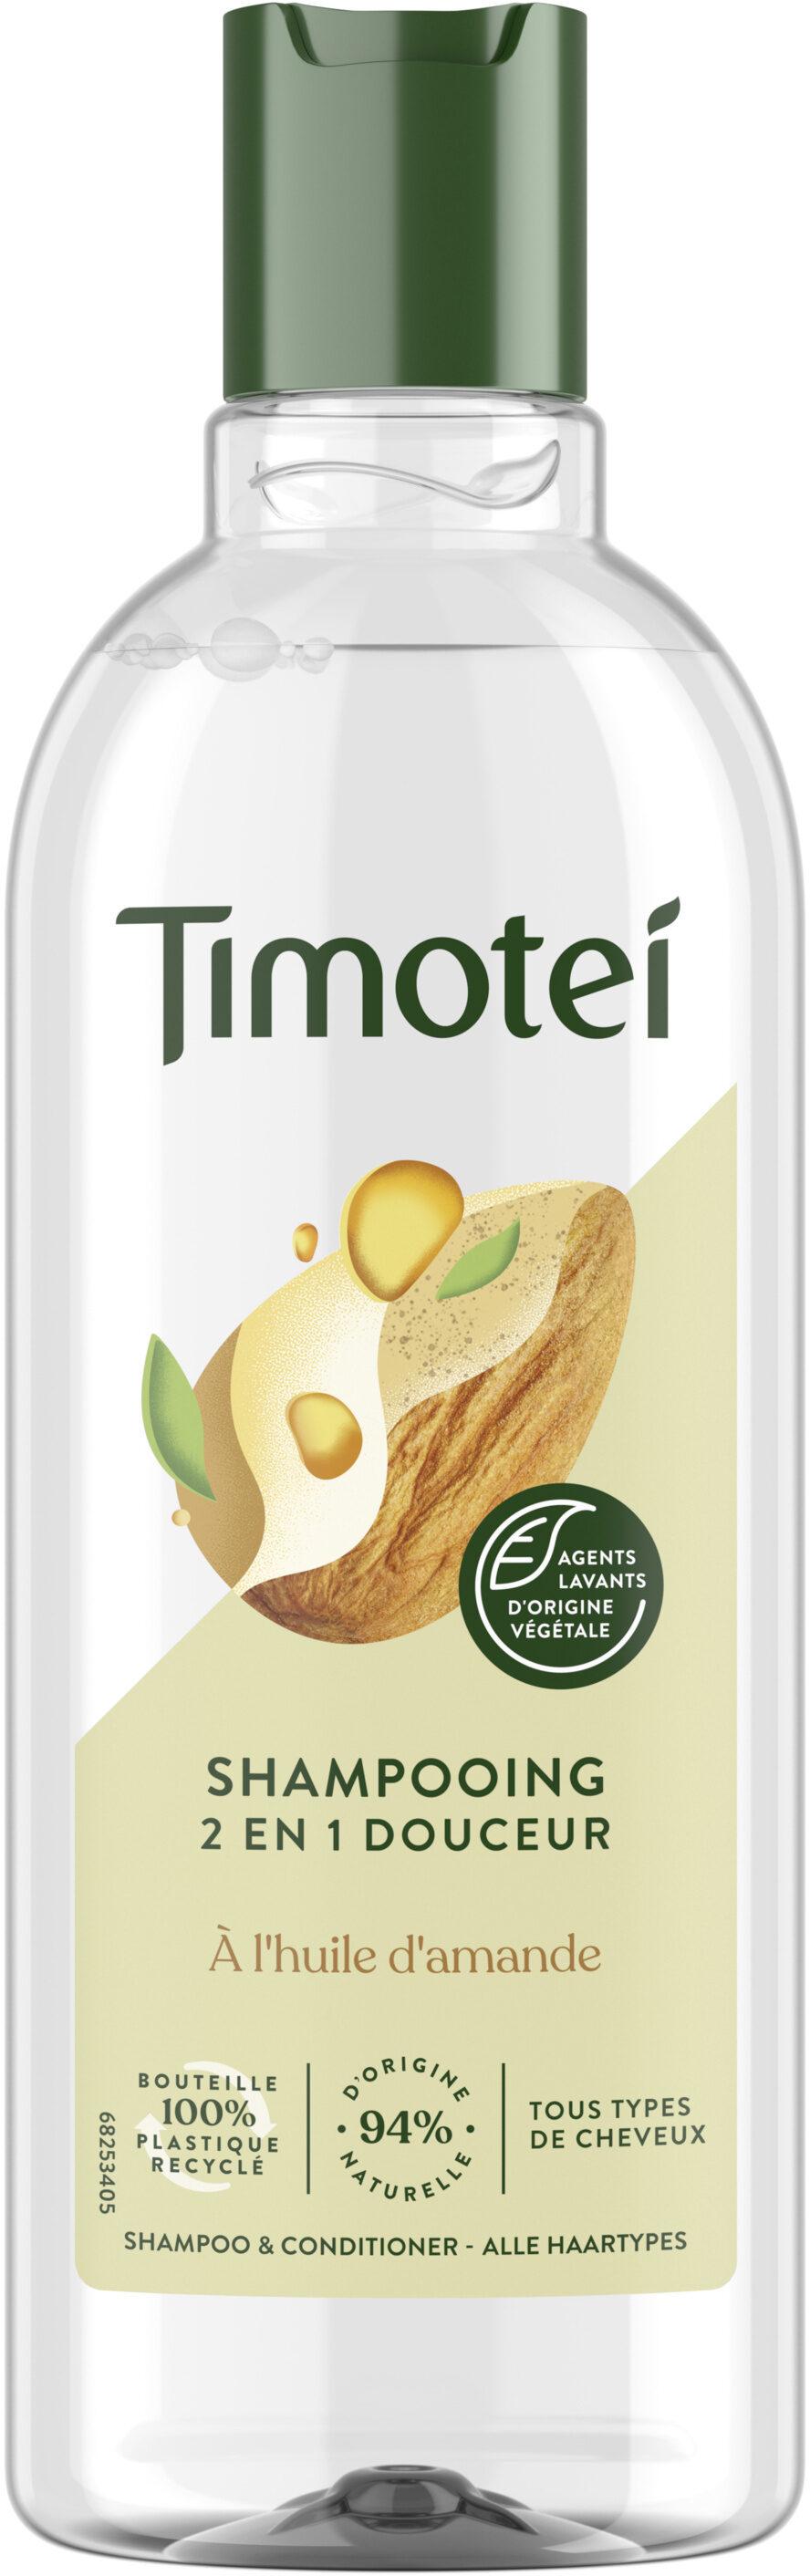 Timotei Shampooing Femme 2 en 1 Douceur - Product - fr